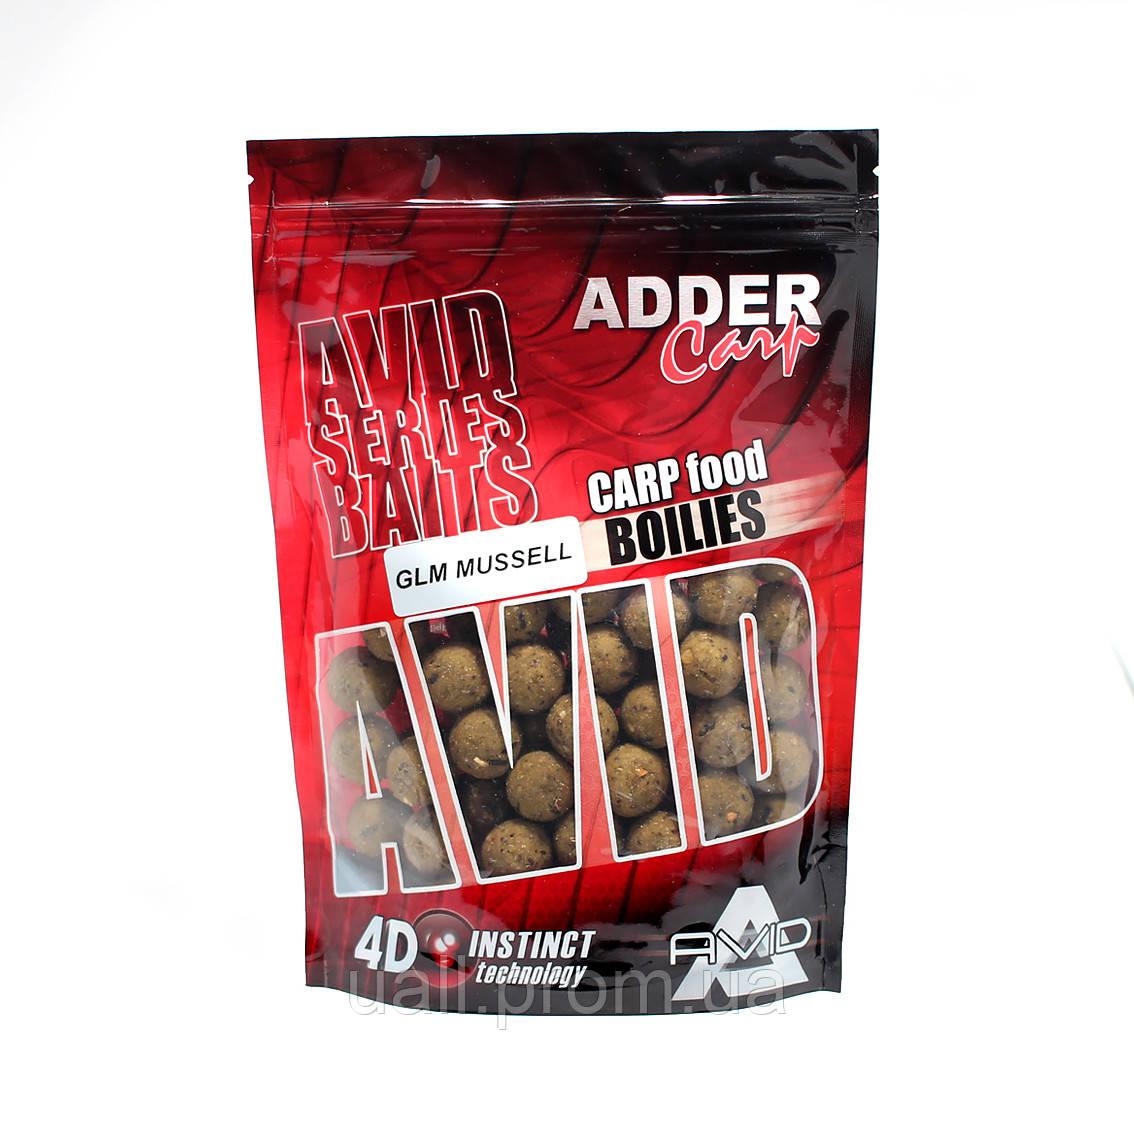 Бойли Adder Carp Boilies AVID GLM Mussell 200g (16mm) (Мідія)